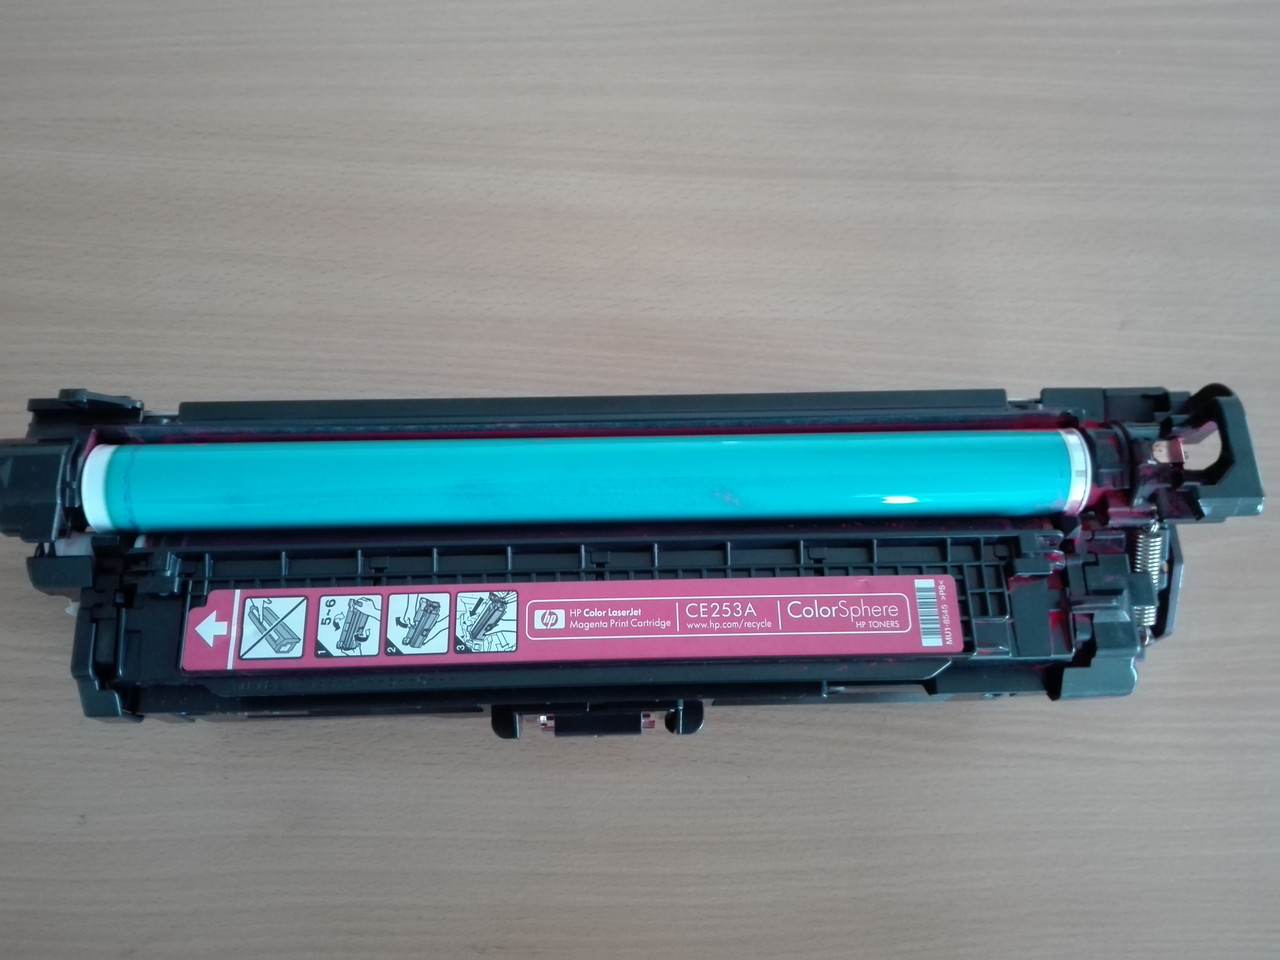 Картридж HP CLJ CM3530/ CP3525 series magenta (CE253A)